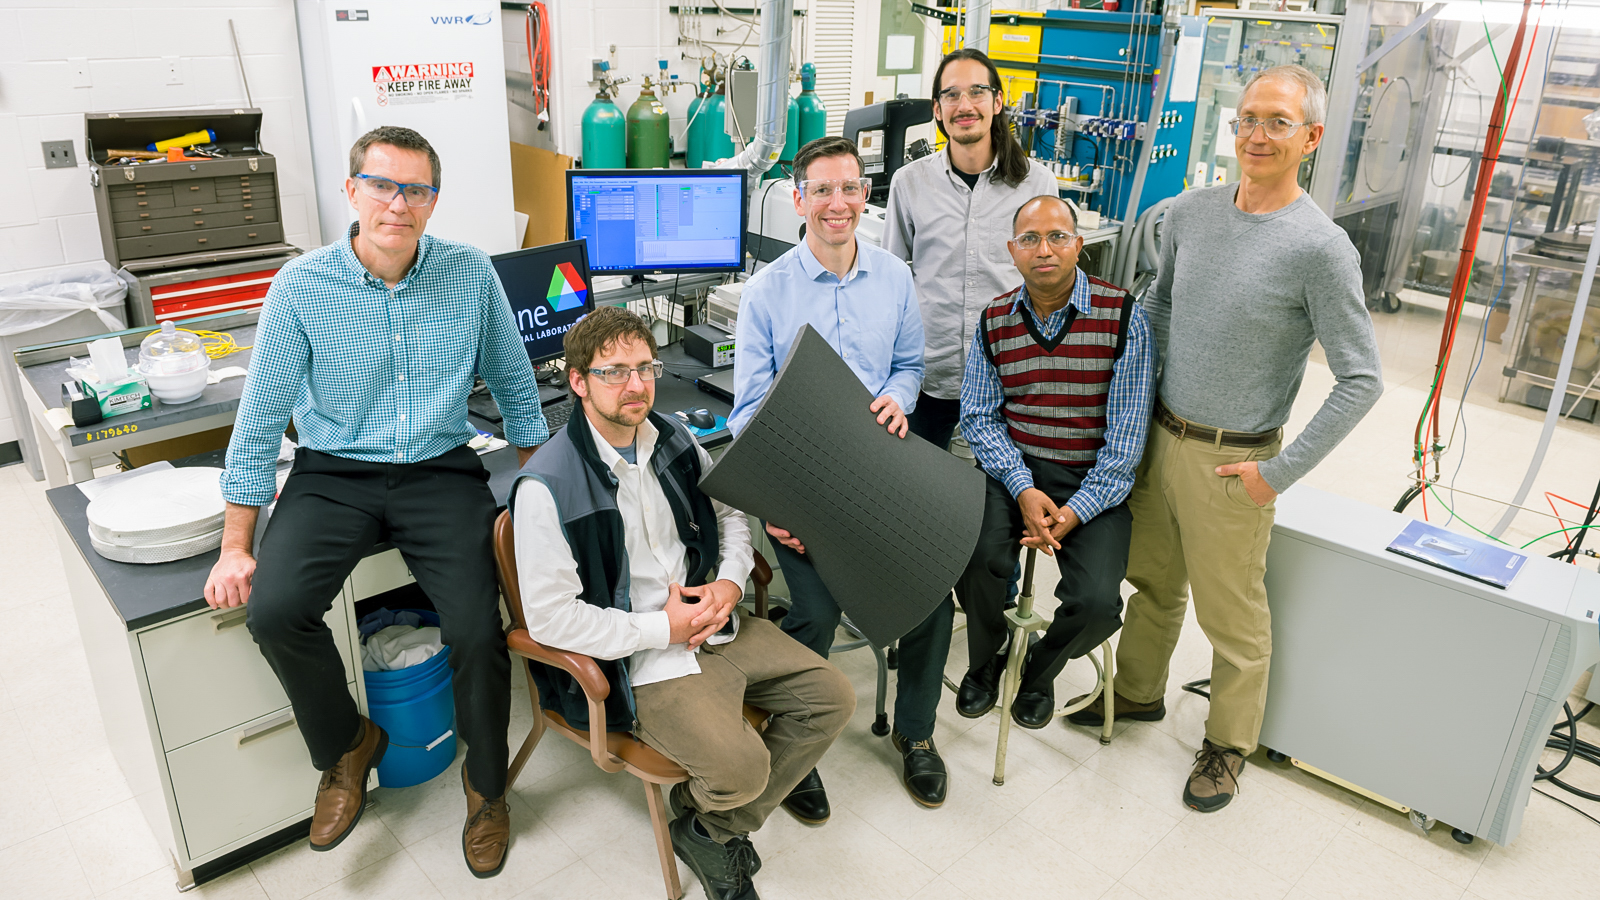 Argonne researchers who helped develop the Oleo Sponge include Jeff Elam, Ed Barry, Seth Darling, Jason Avila, Anil Mane and Joe Libera.